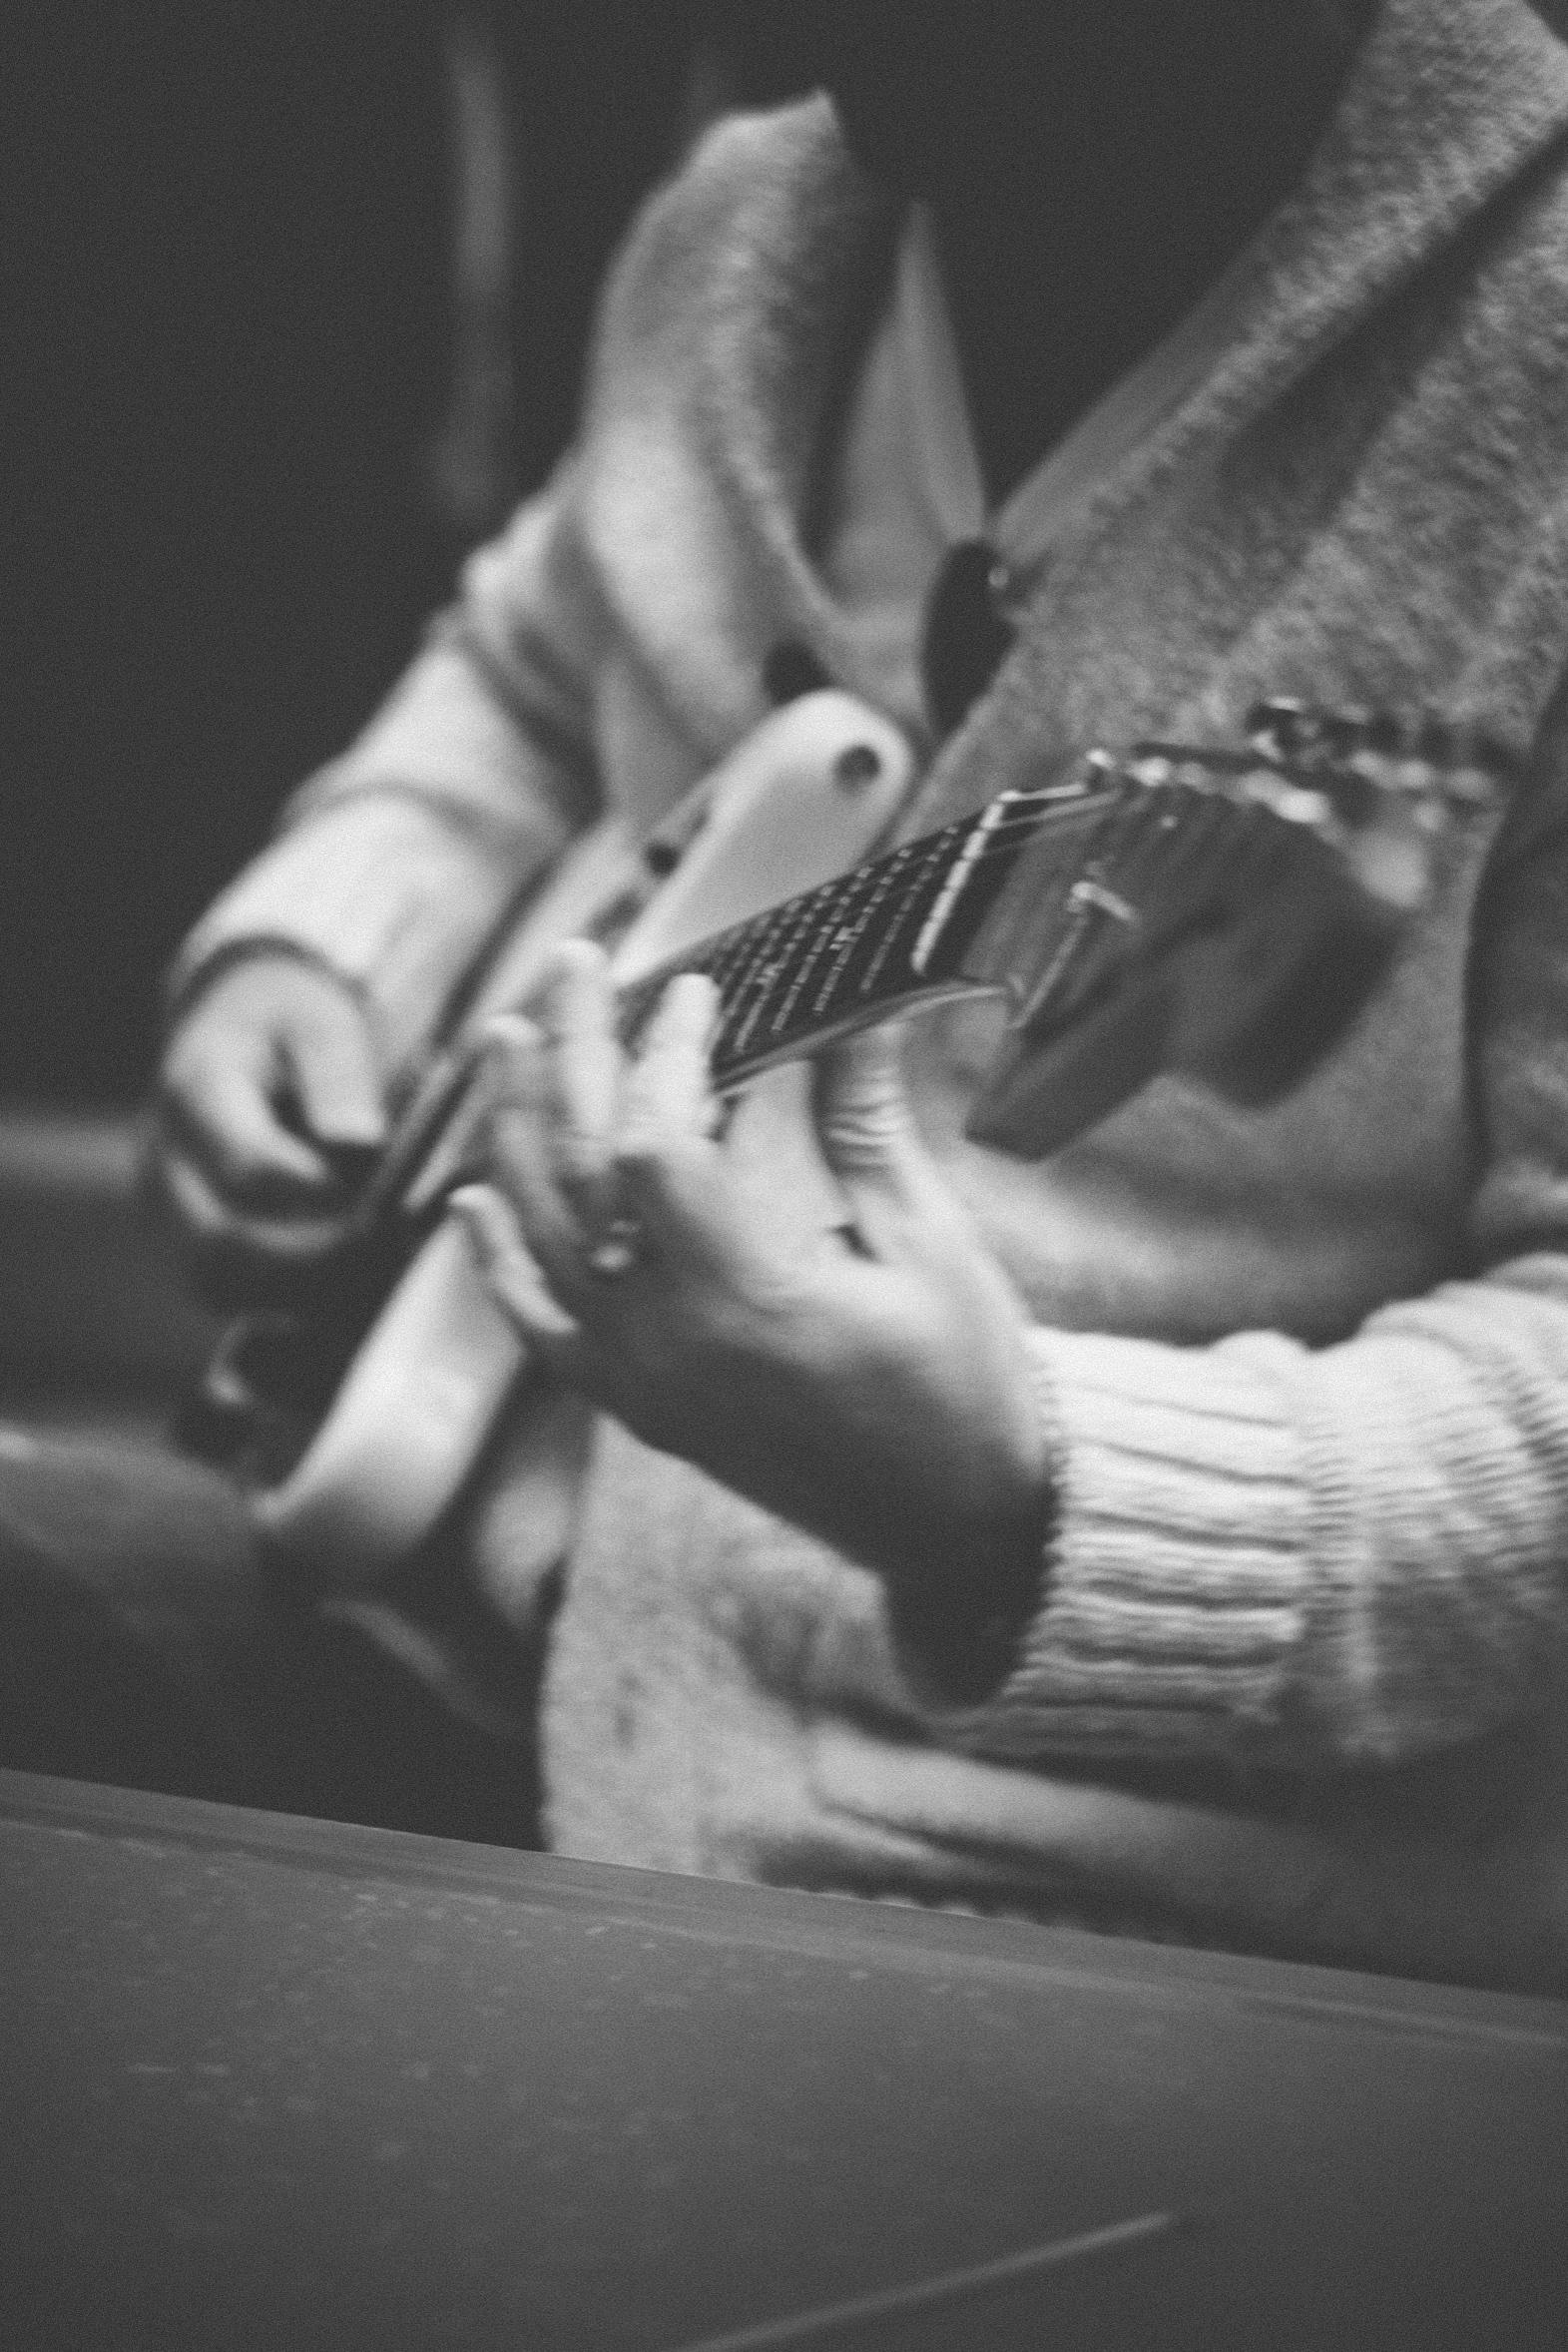 Sergio Gaetani with his Fender Jaguar. Photo by Jessica Reaves